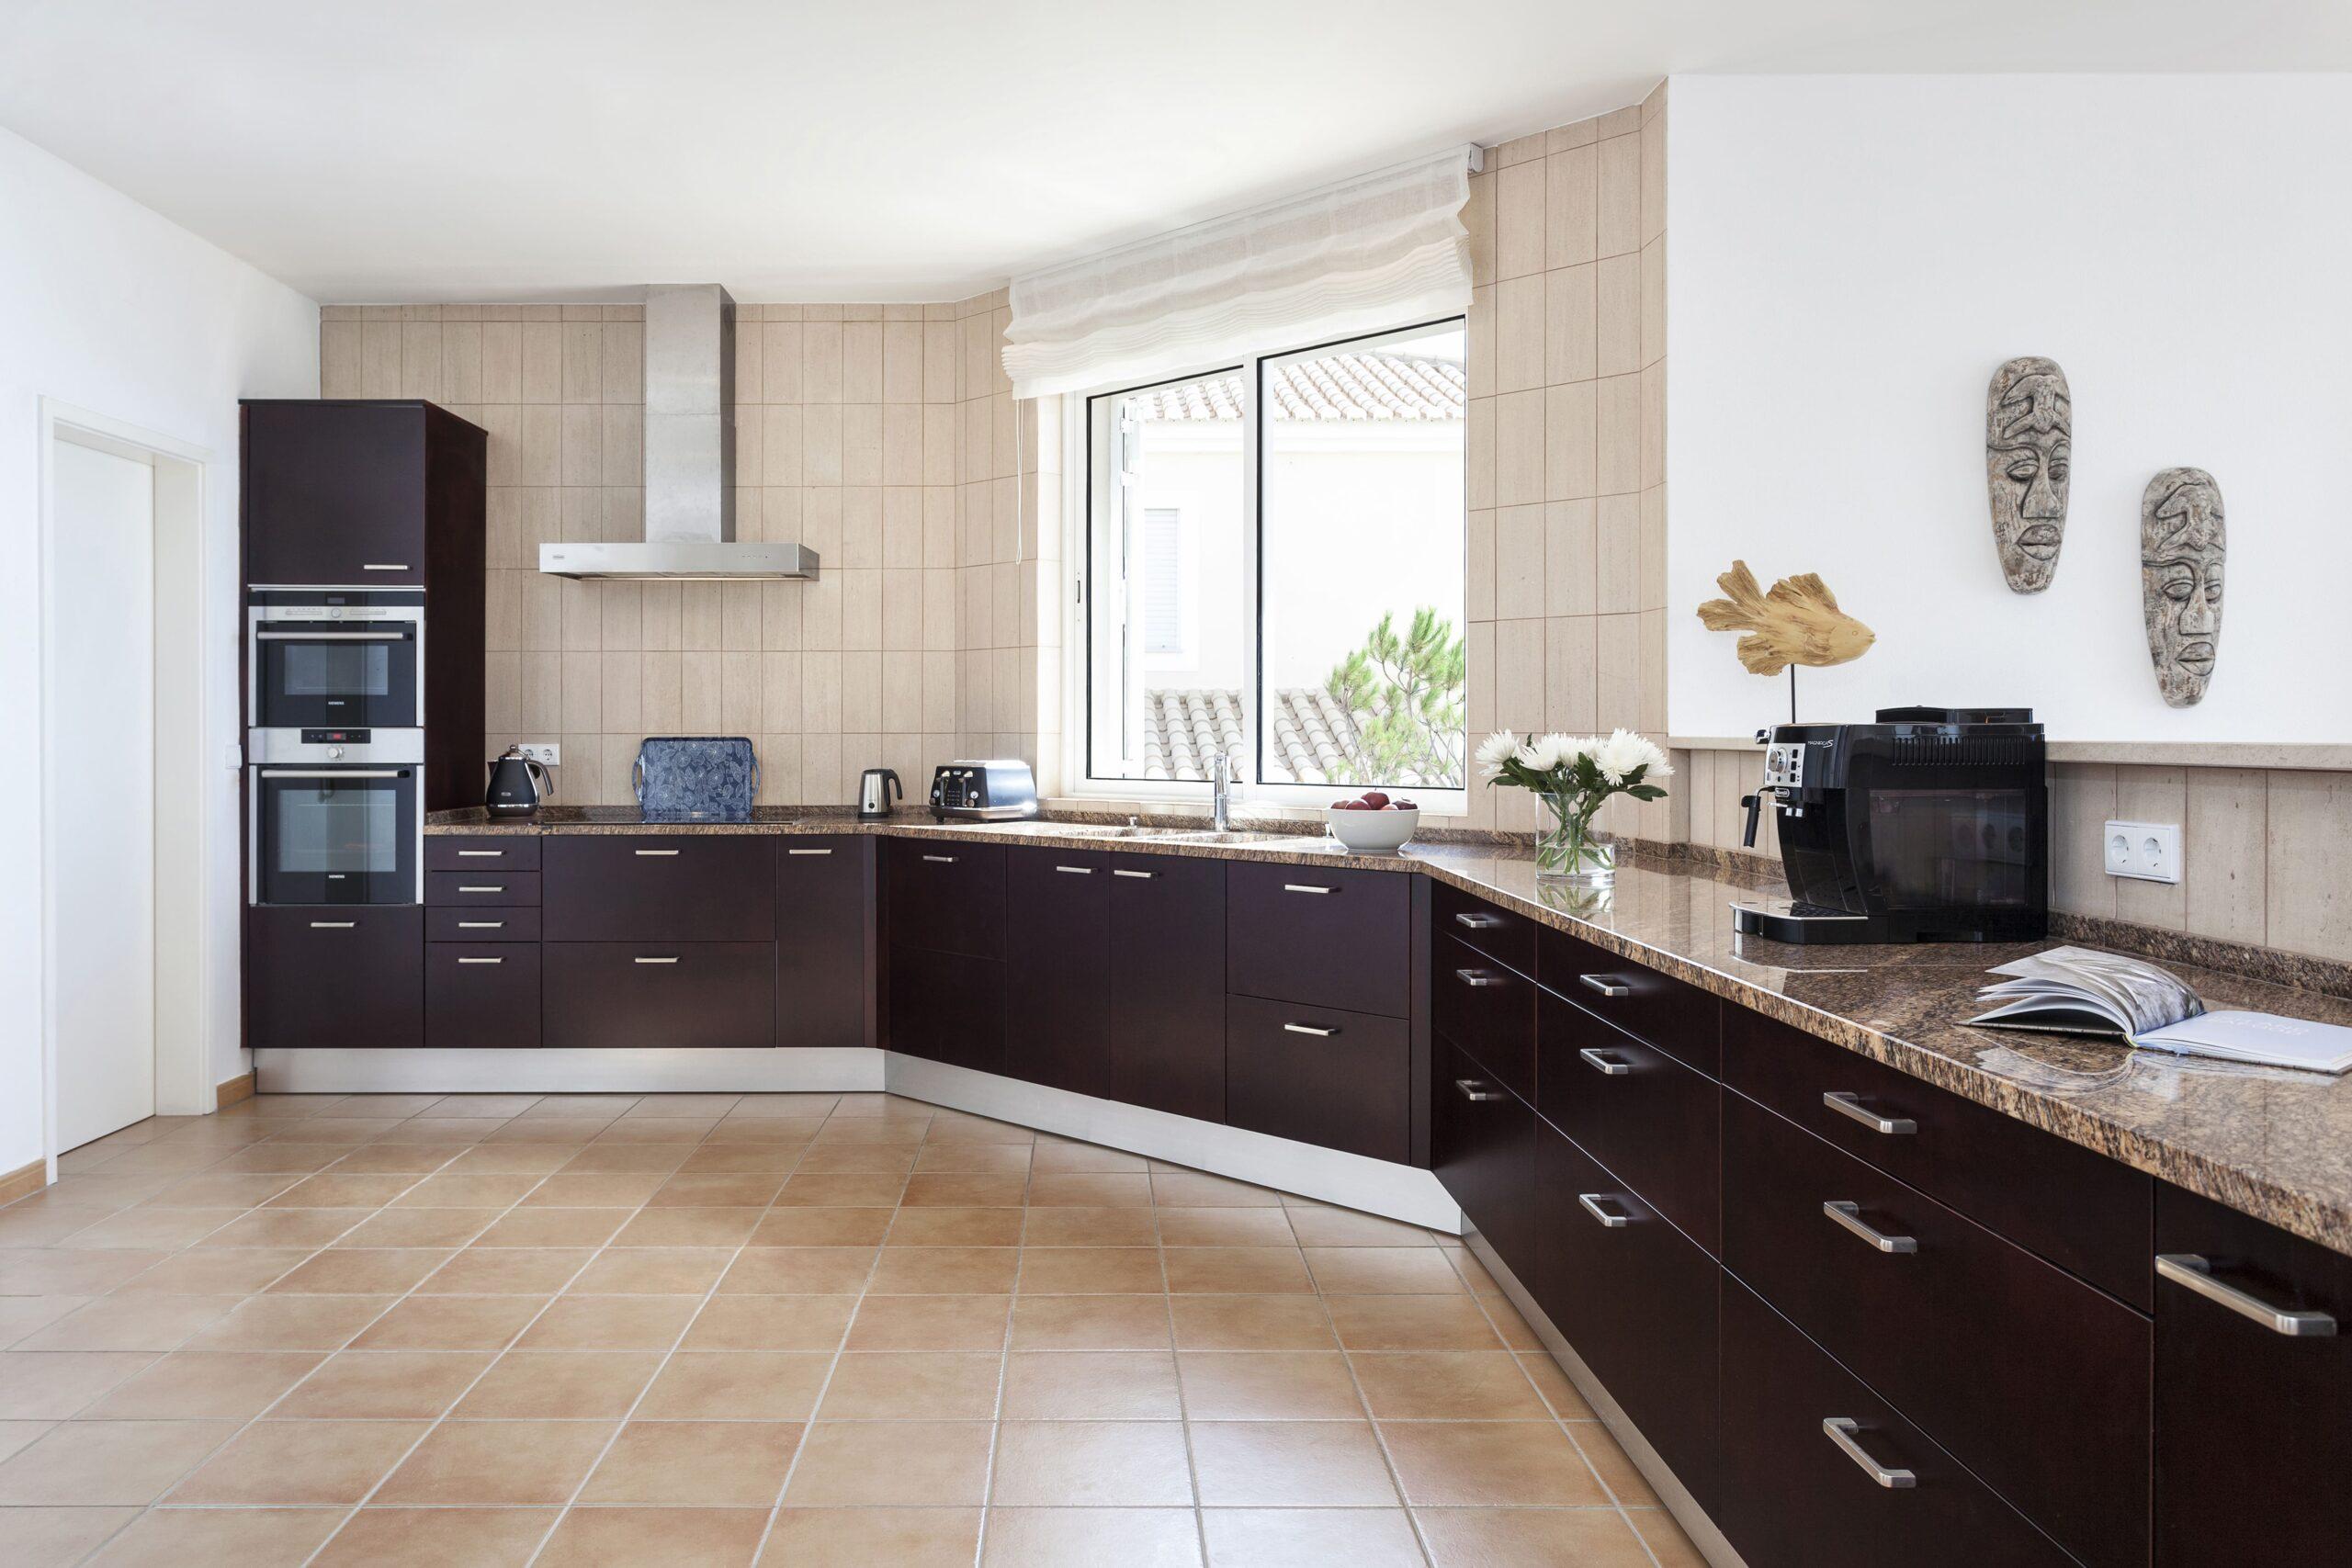 Villa Mar à Vista - Kitchen